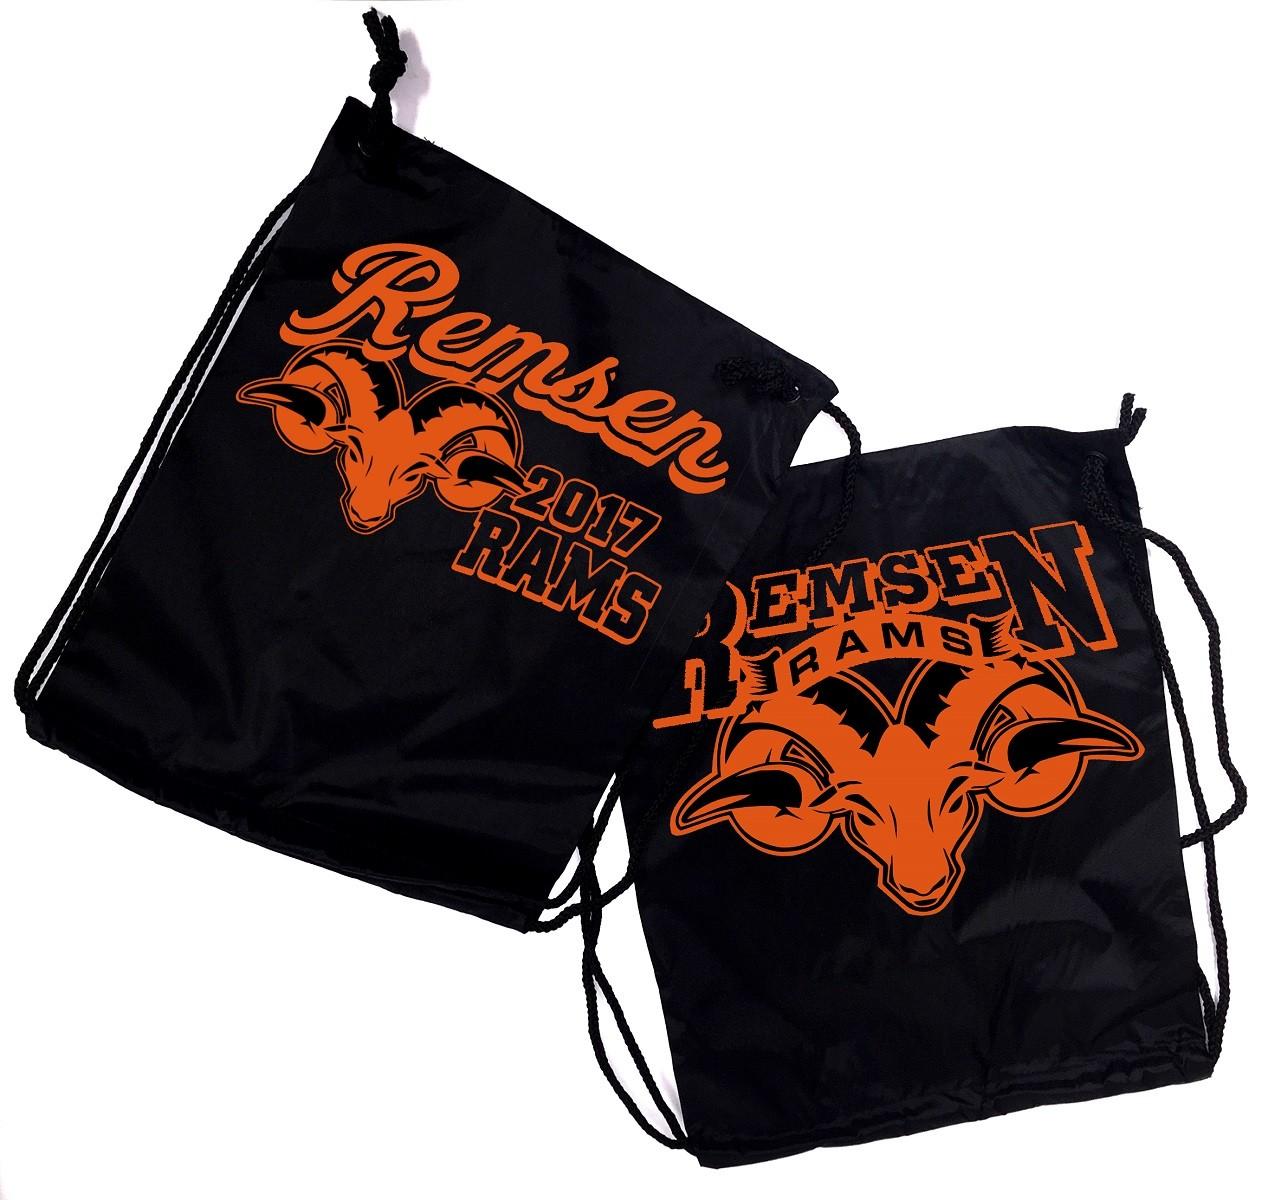 Remsen Rams Drawstring Backpacks